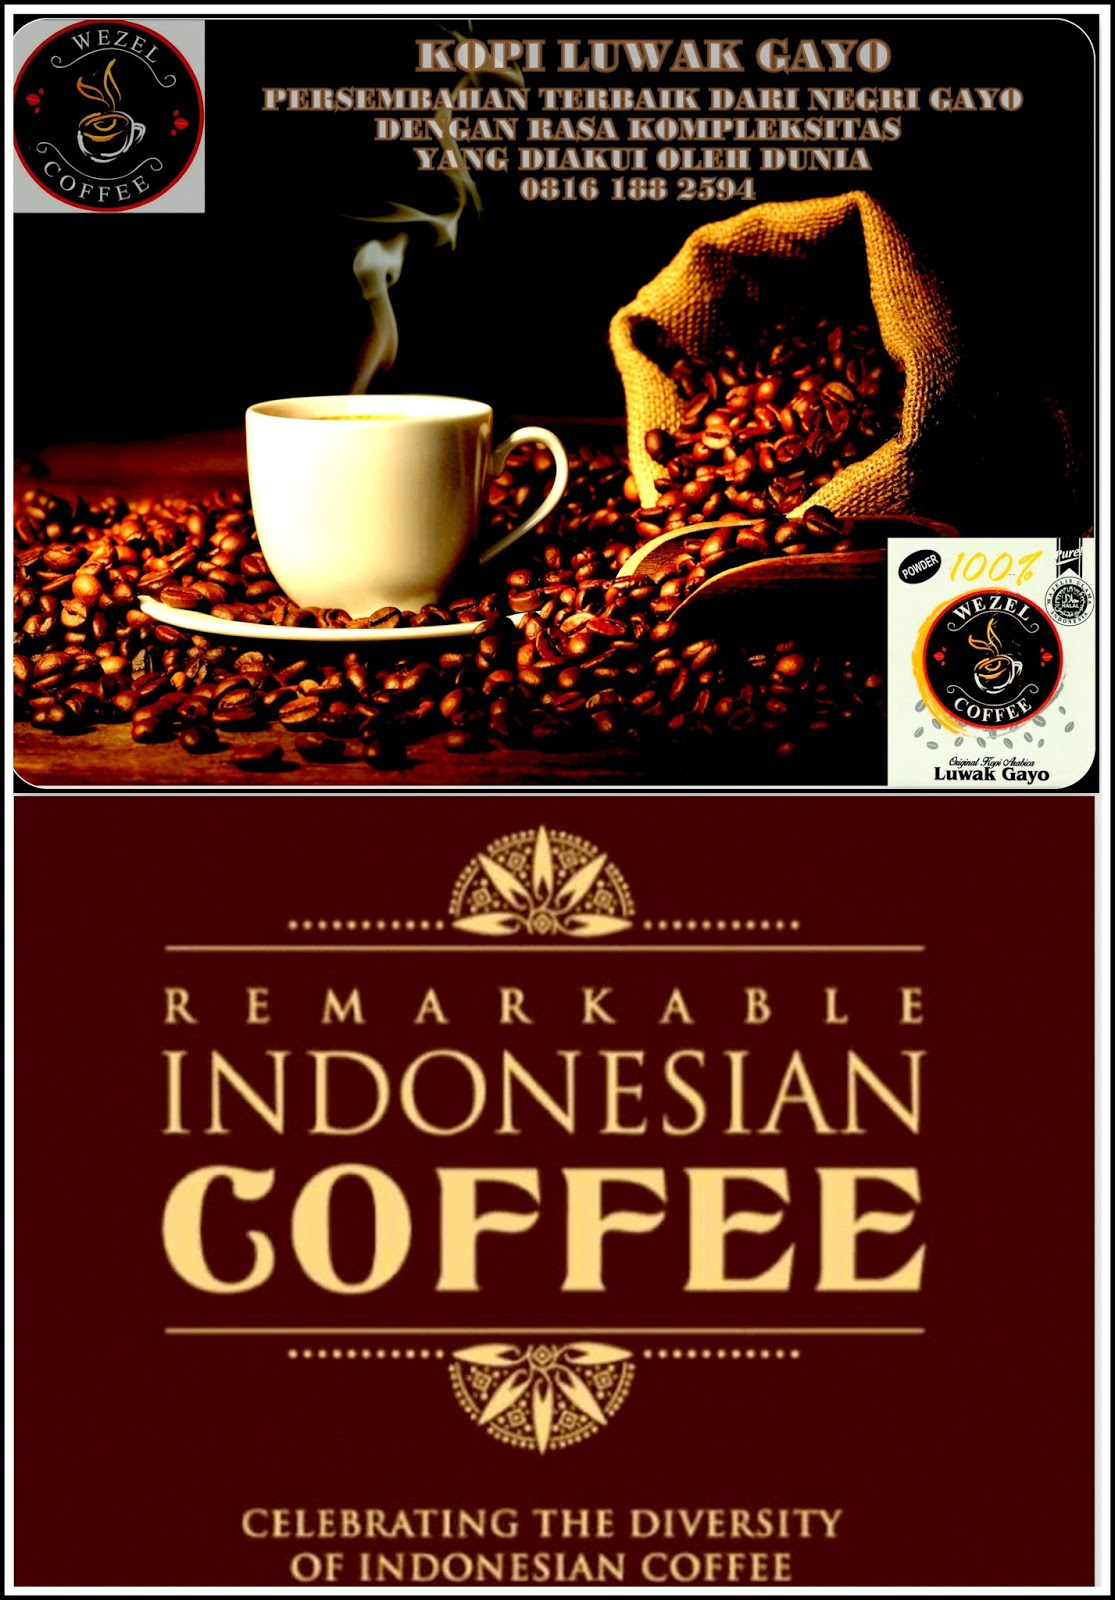 Coffee Luwak Wild Civet Origin Kopi From Indonesia Robusta Premium Gayo Land The Best Arabica Mountain Indonsian